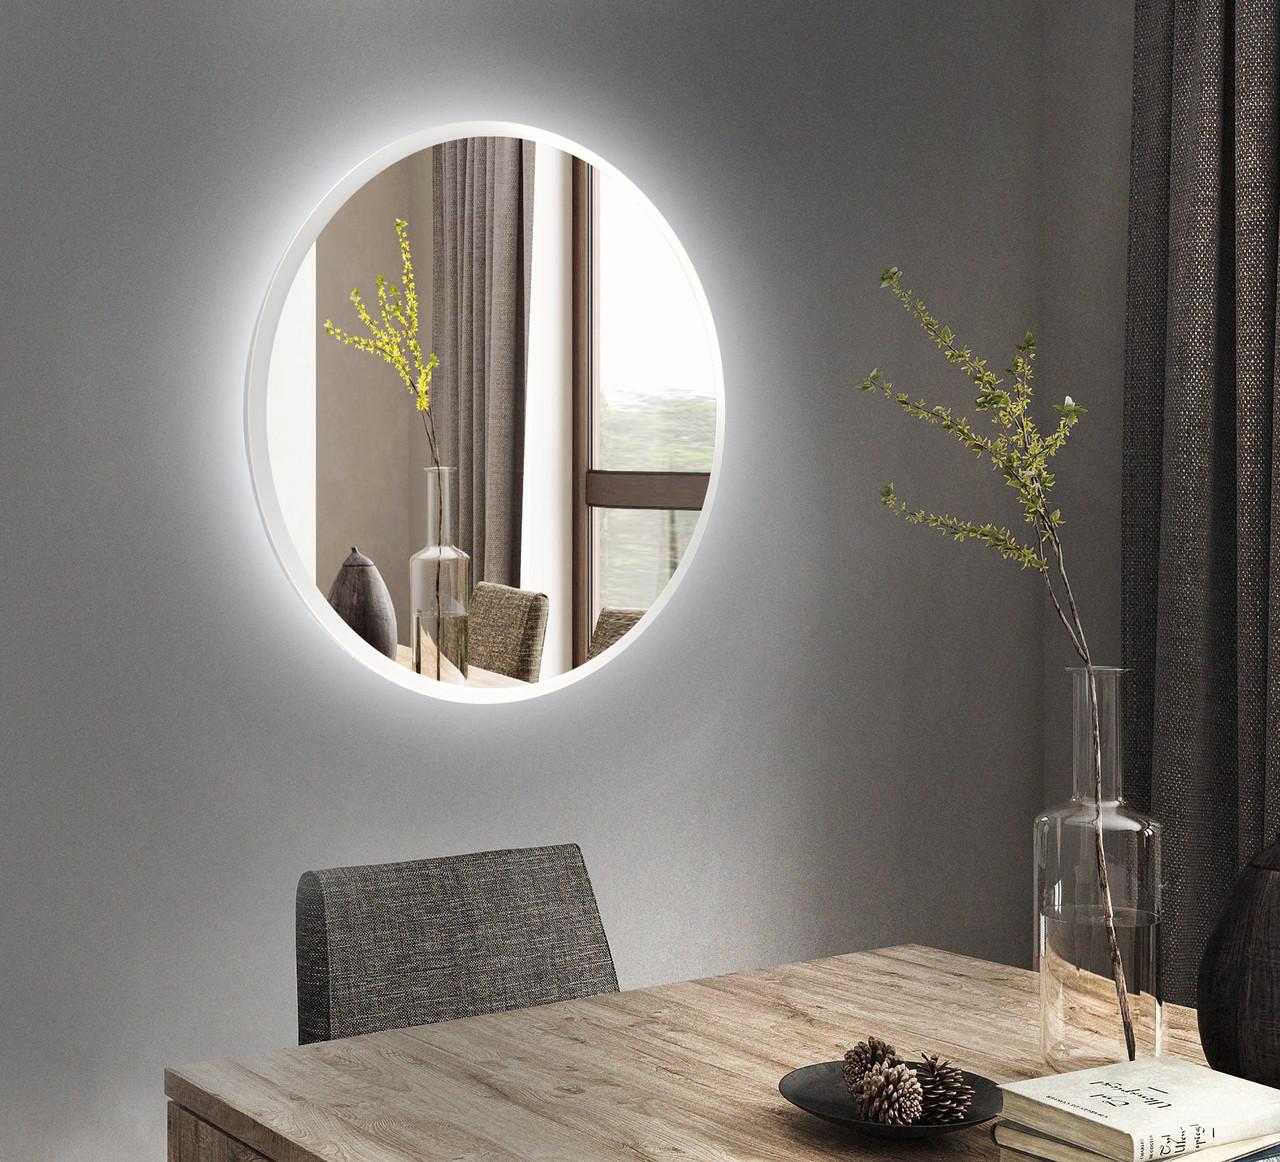 Белое круглое зеркало с подсветкой 800 мм   Біле кругле дзеркало з підсвічуванням 800 мм